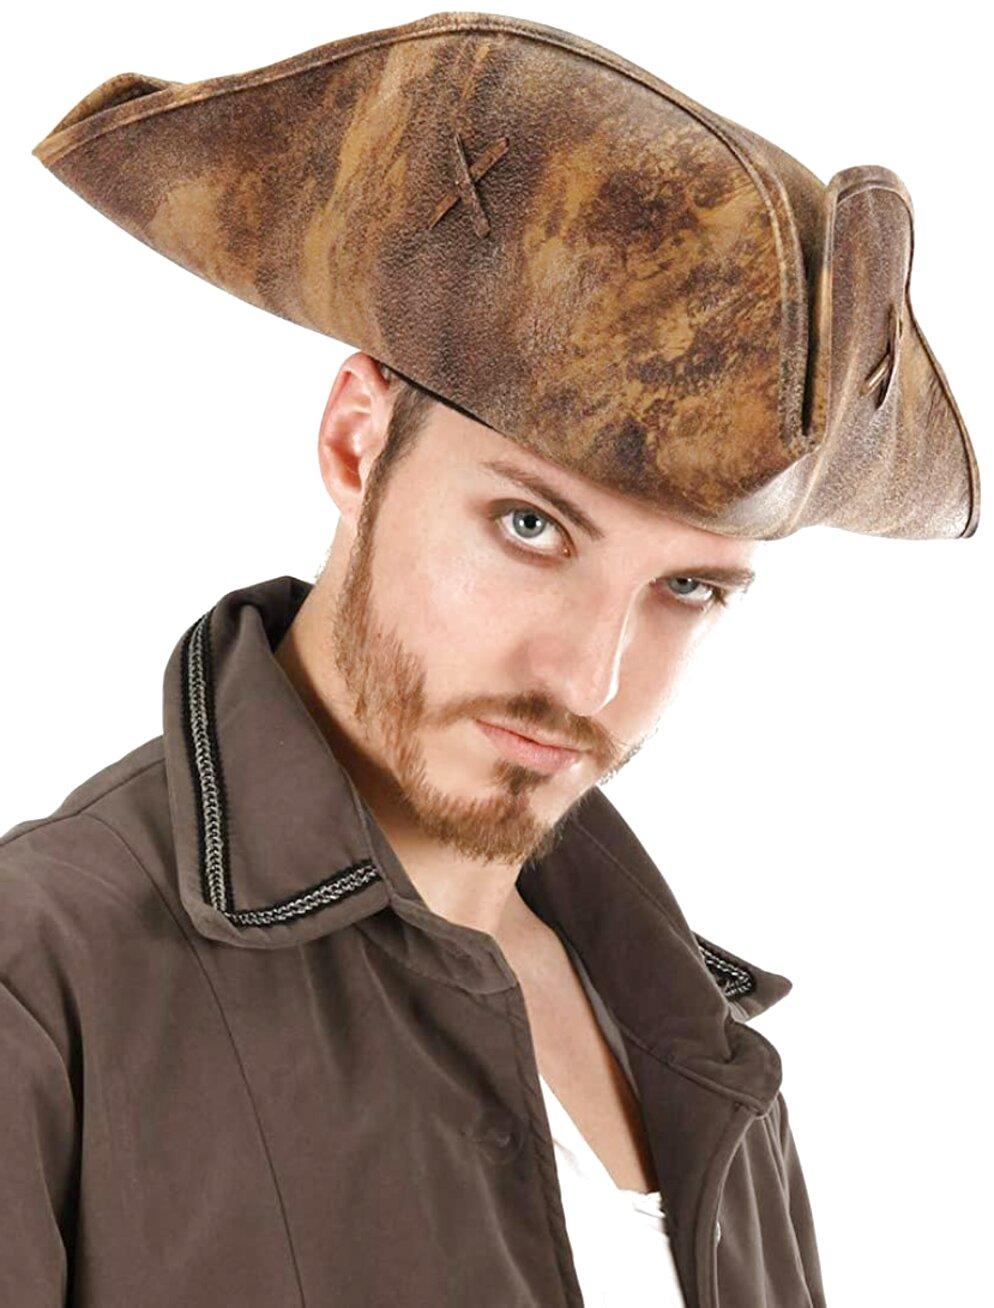 jack sparrow hat for sale